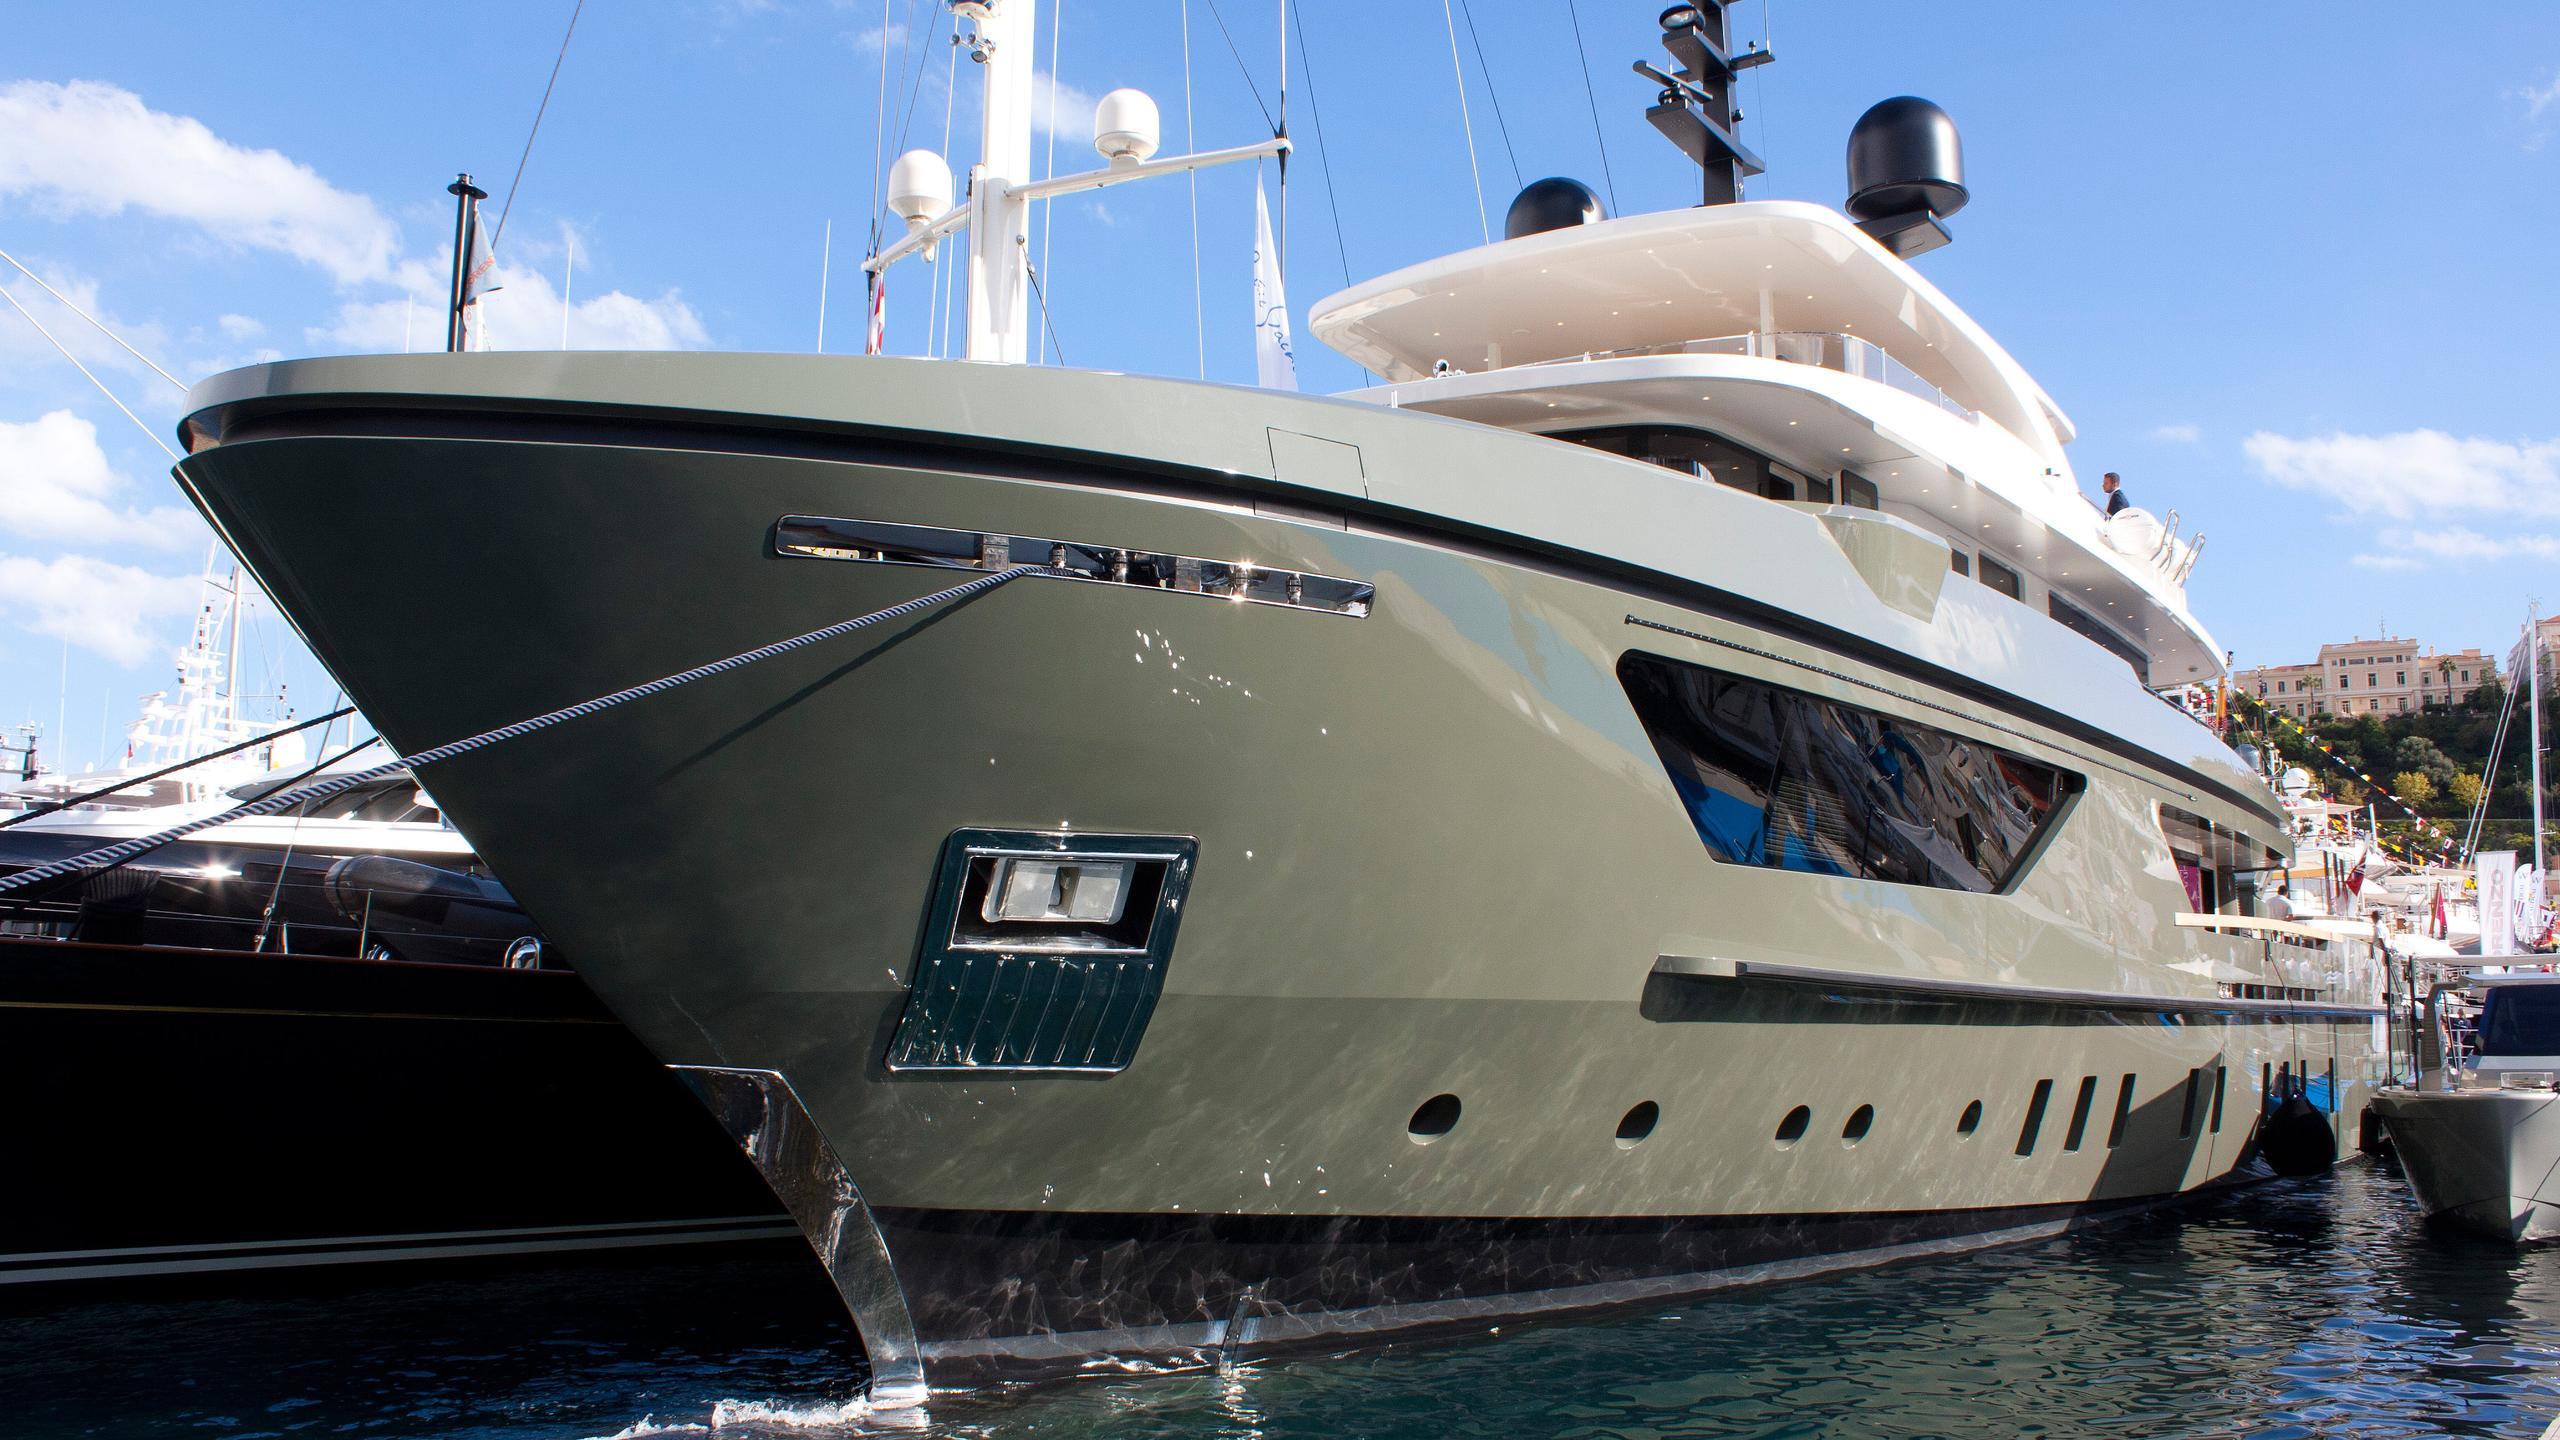 moka-expedition-motor-yacht-sanlorenzo-460-exp-2015-42m-bow-moored